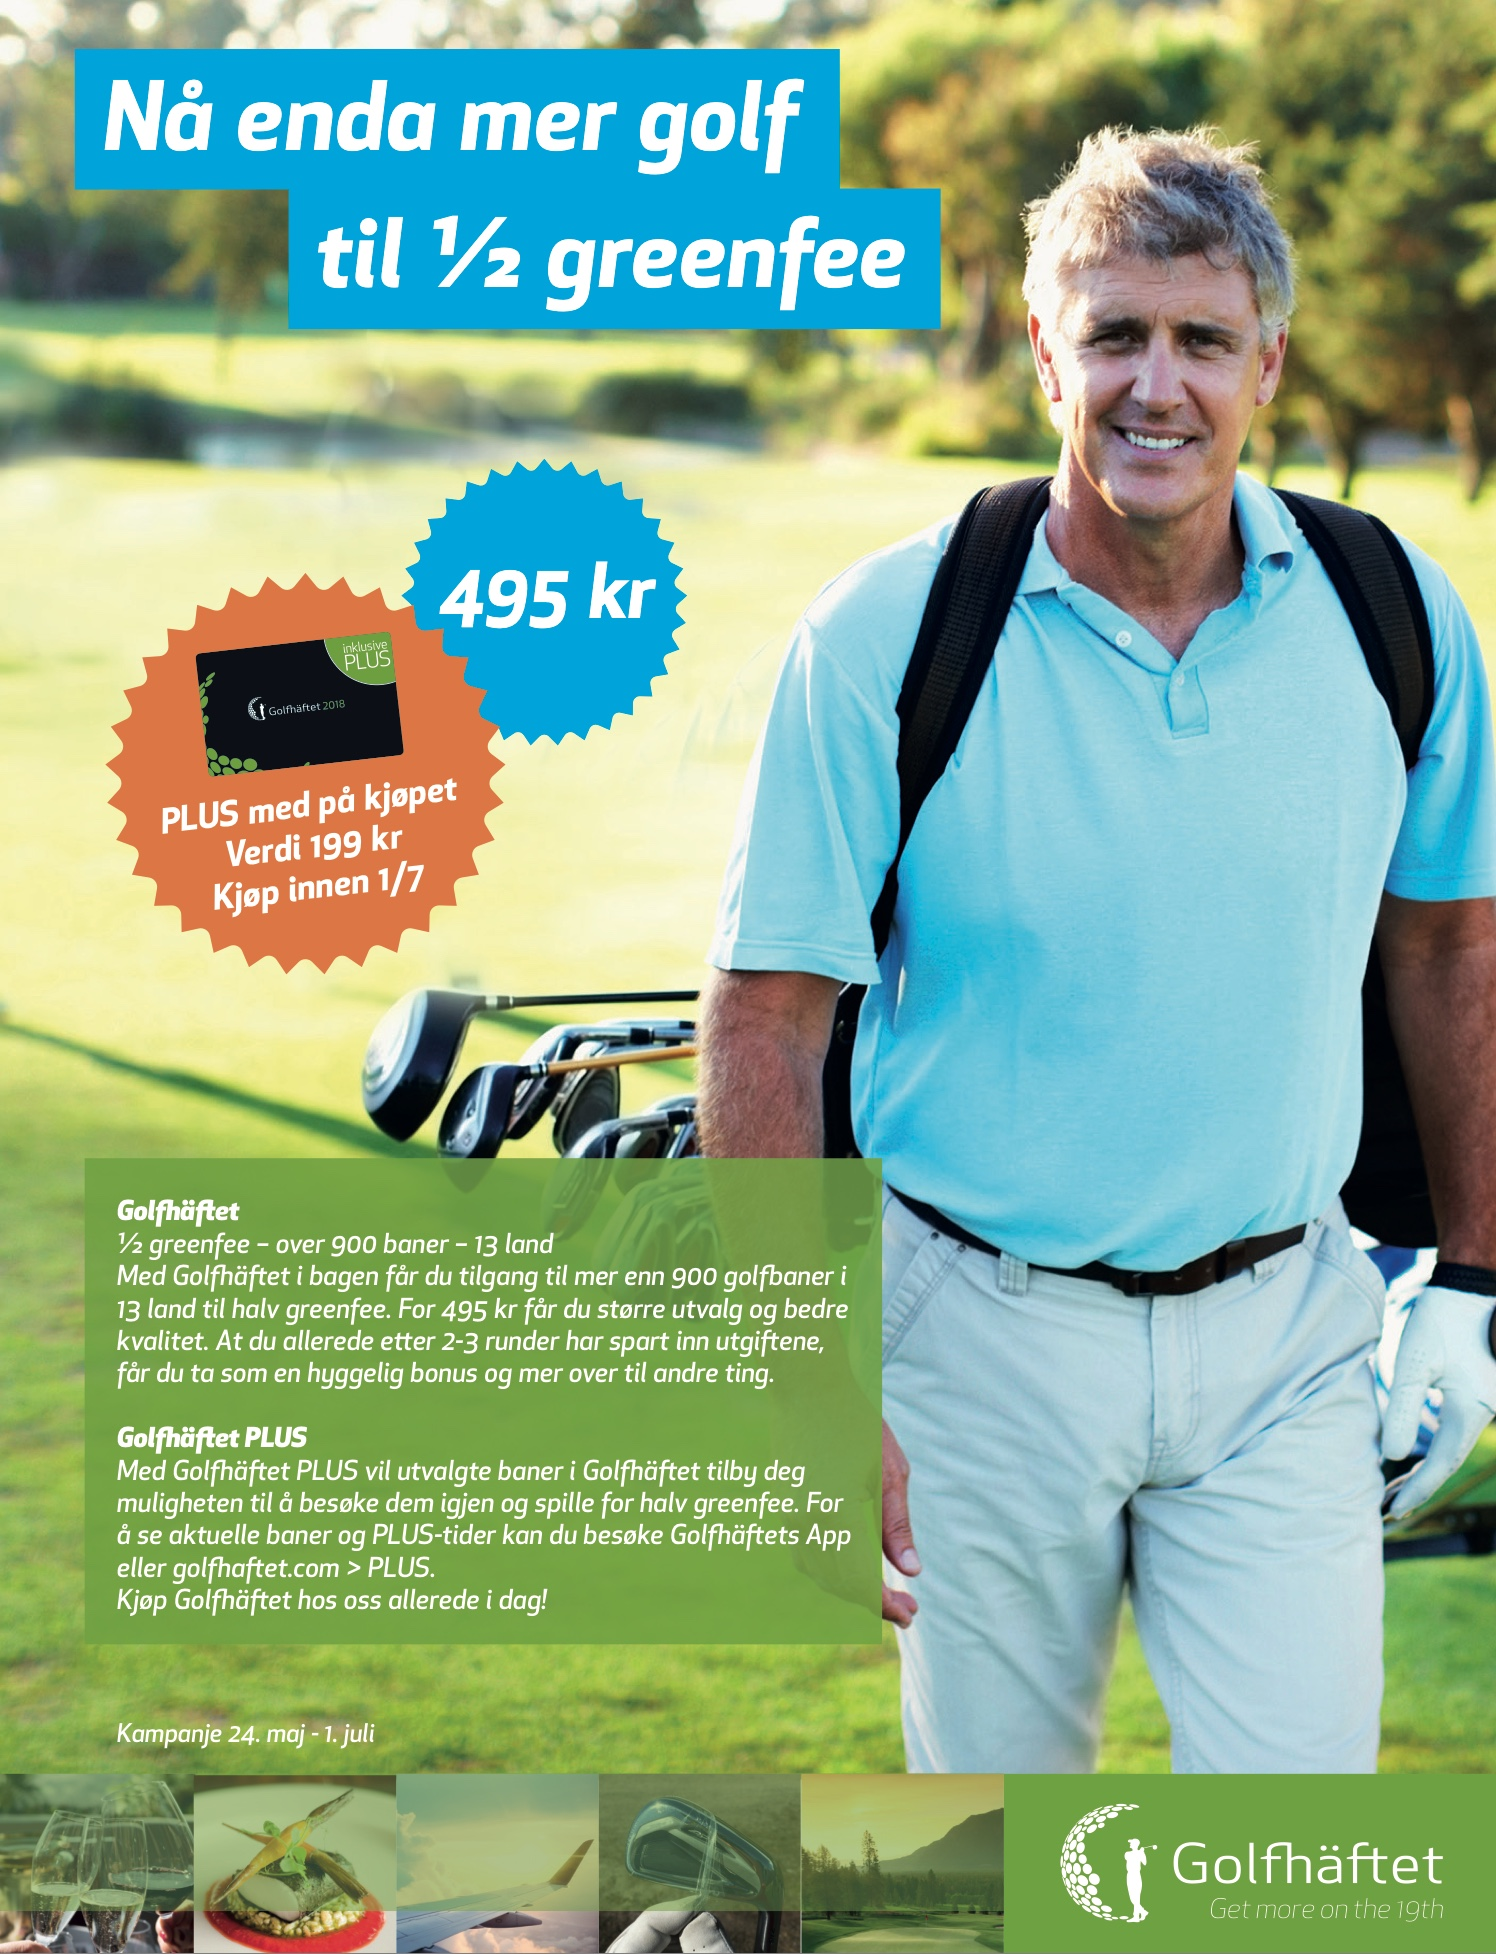 Siste sjanse - Golfheftet sommar kampanje!